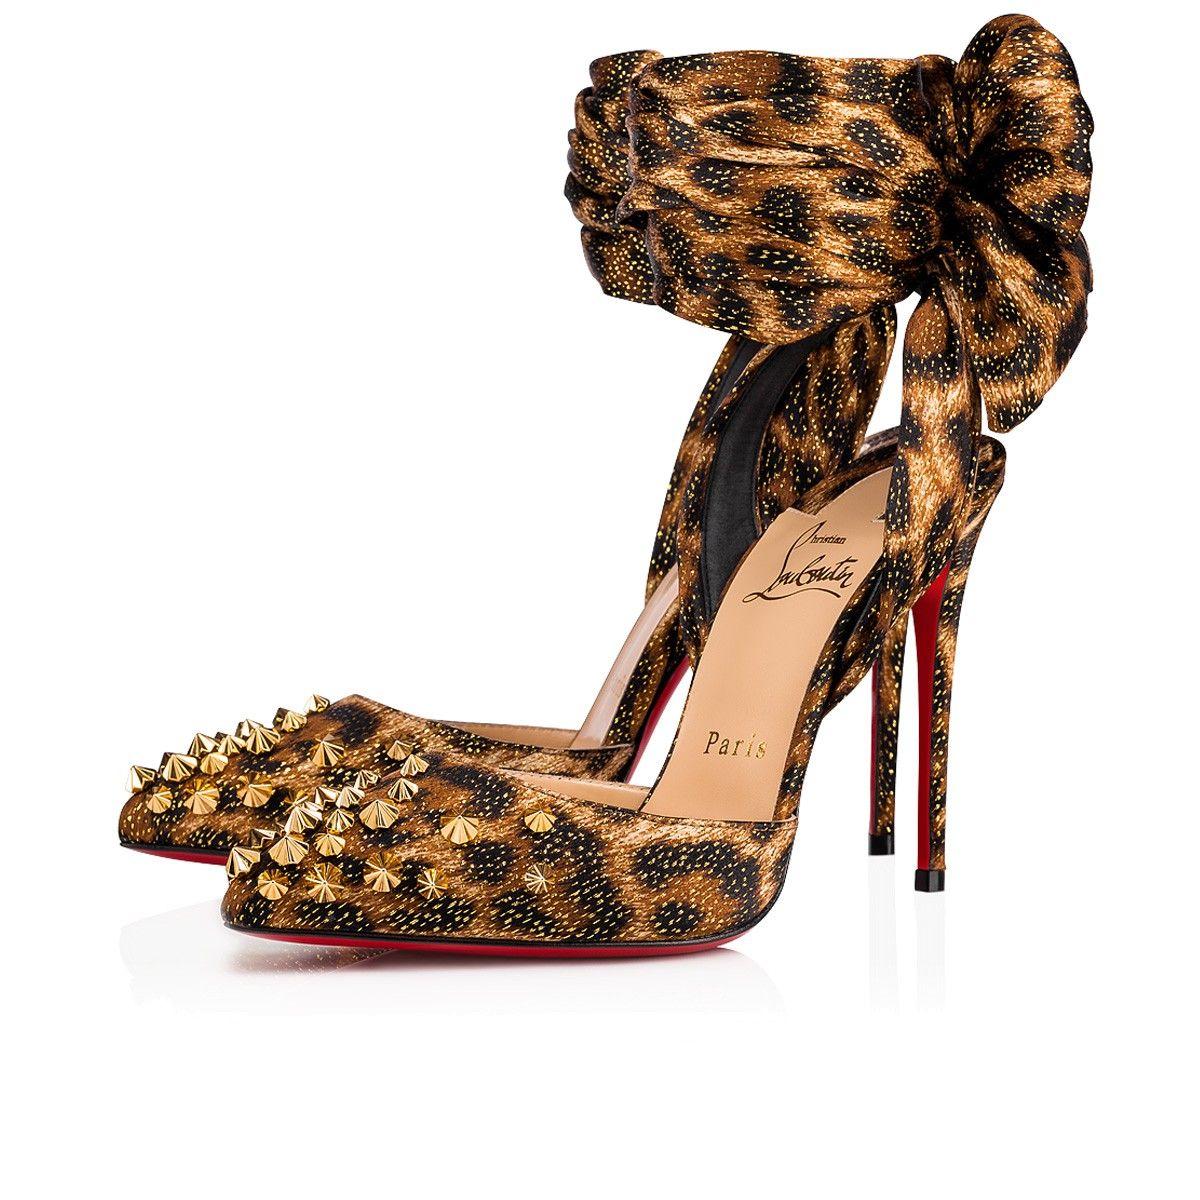 bc757136c8f Drama Douce 100 Black/Gold Lurex - Women Shoes - Christian Louboutin ...